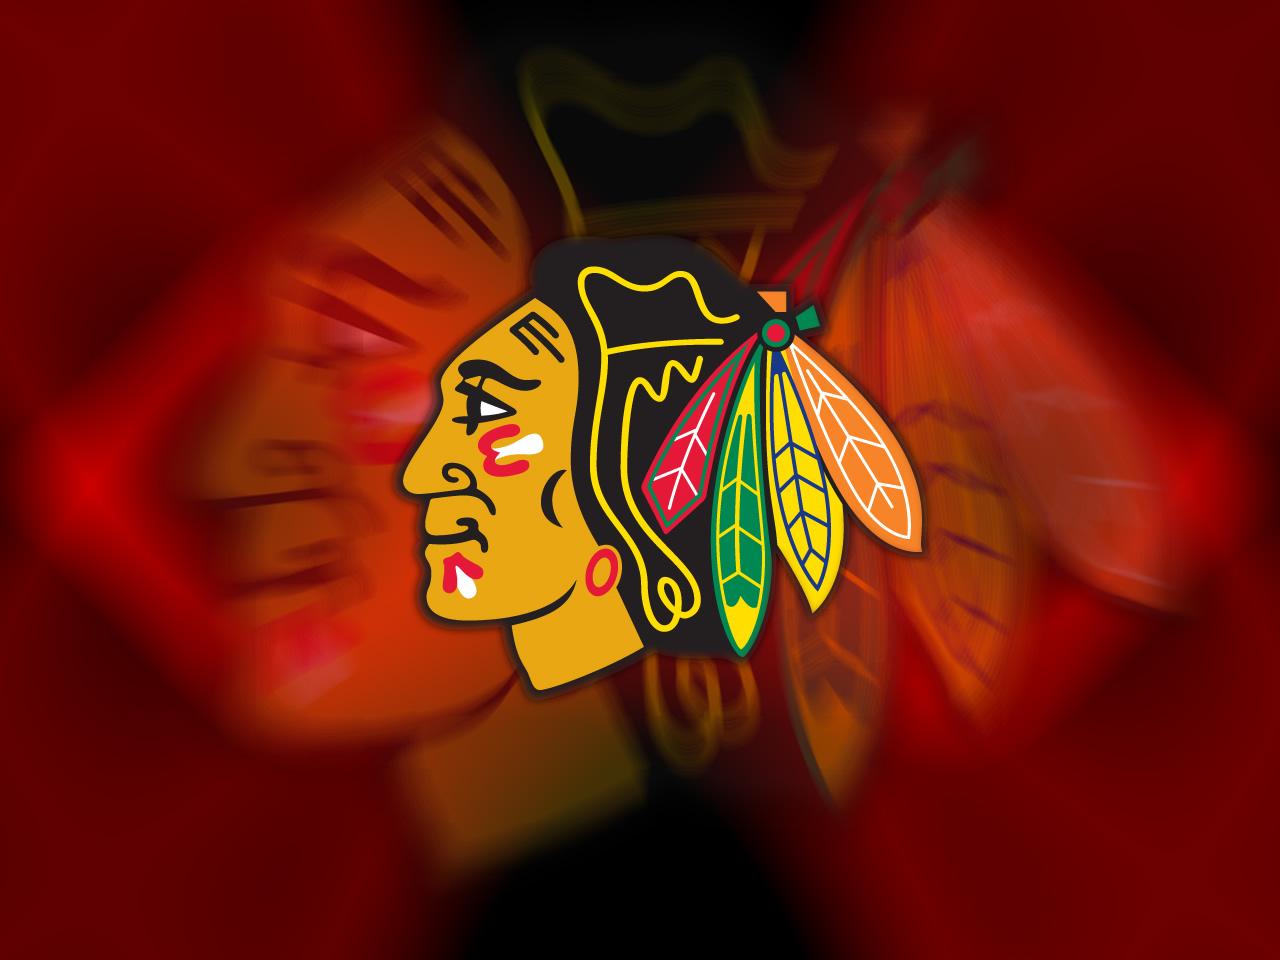 Chicago blackhawks wallpaper 15348 1280x960px chicago blackhawks wallpaper 15348 voltagebd Images